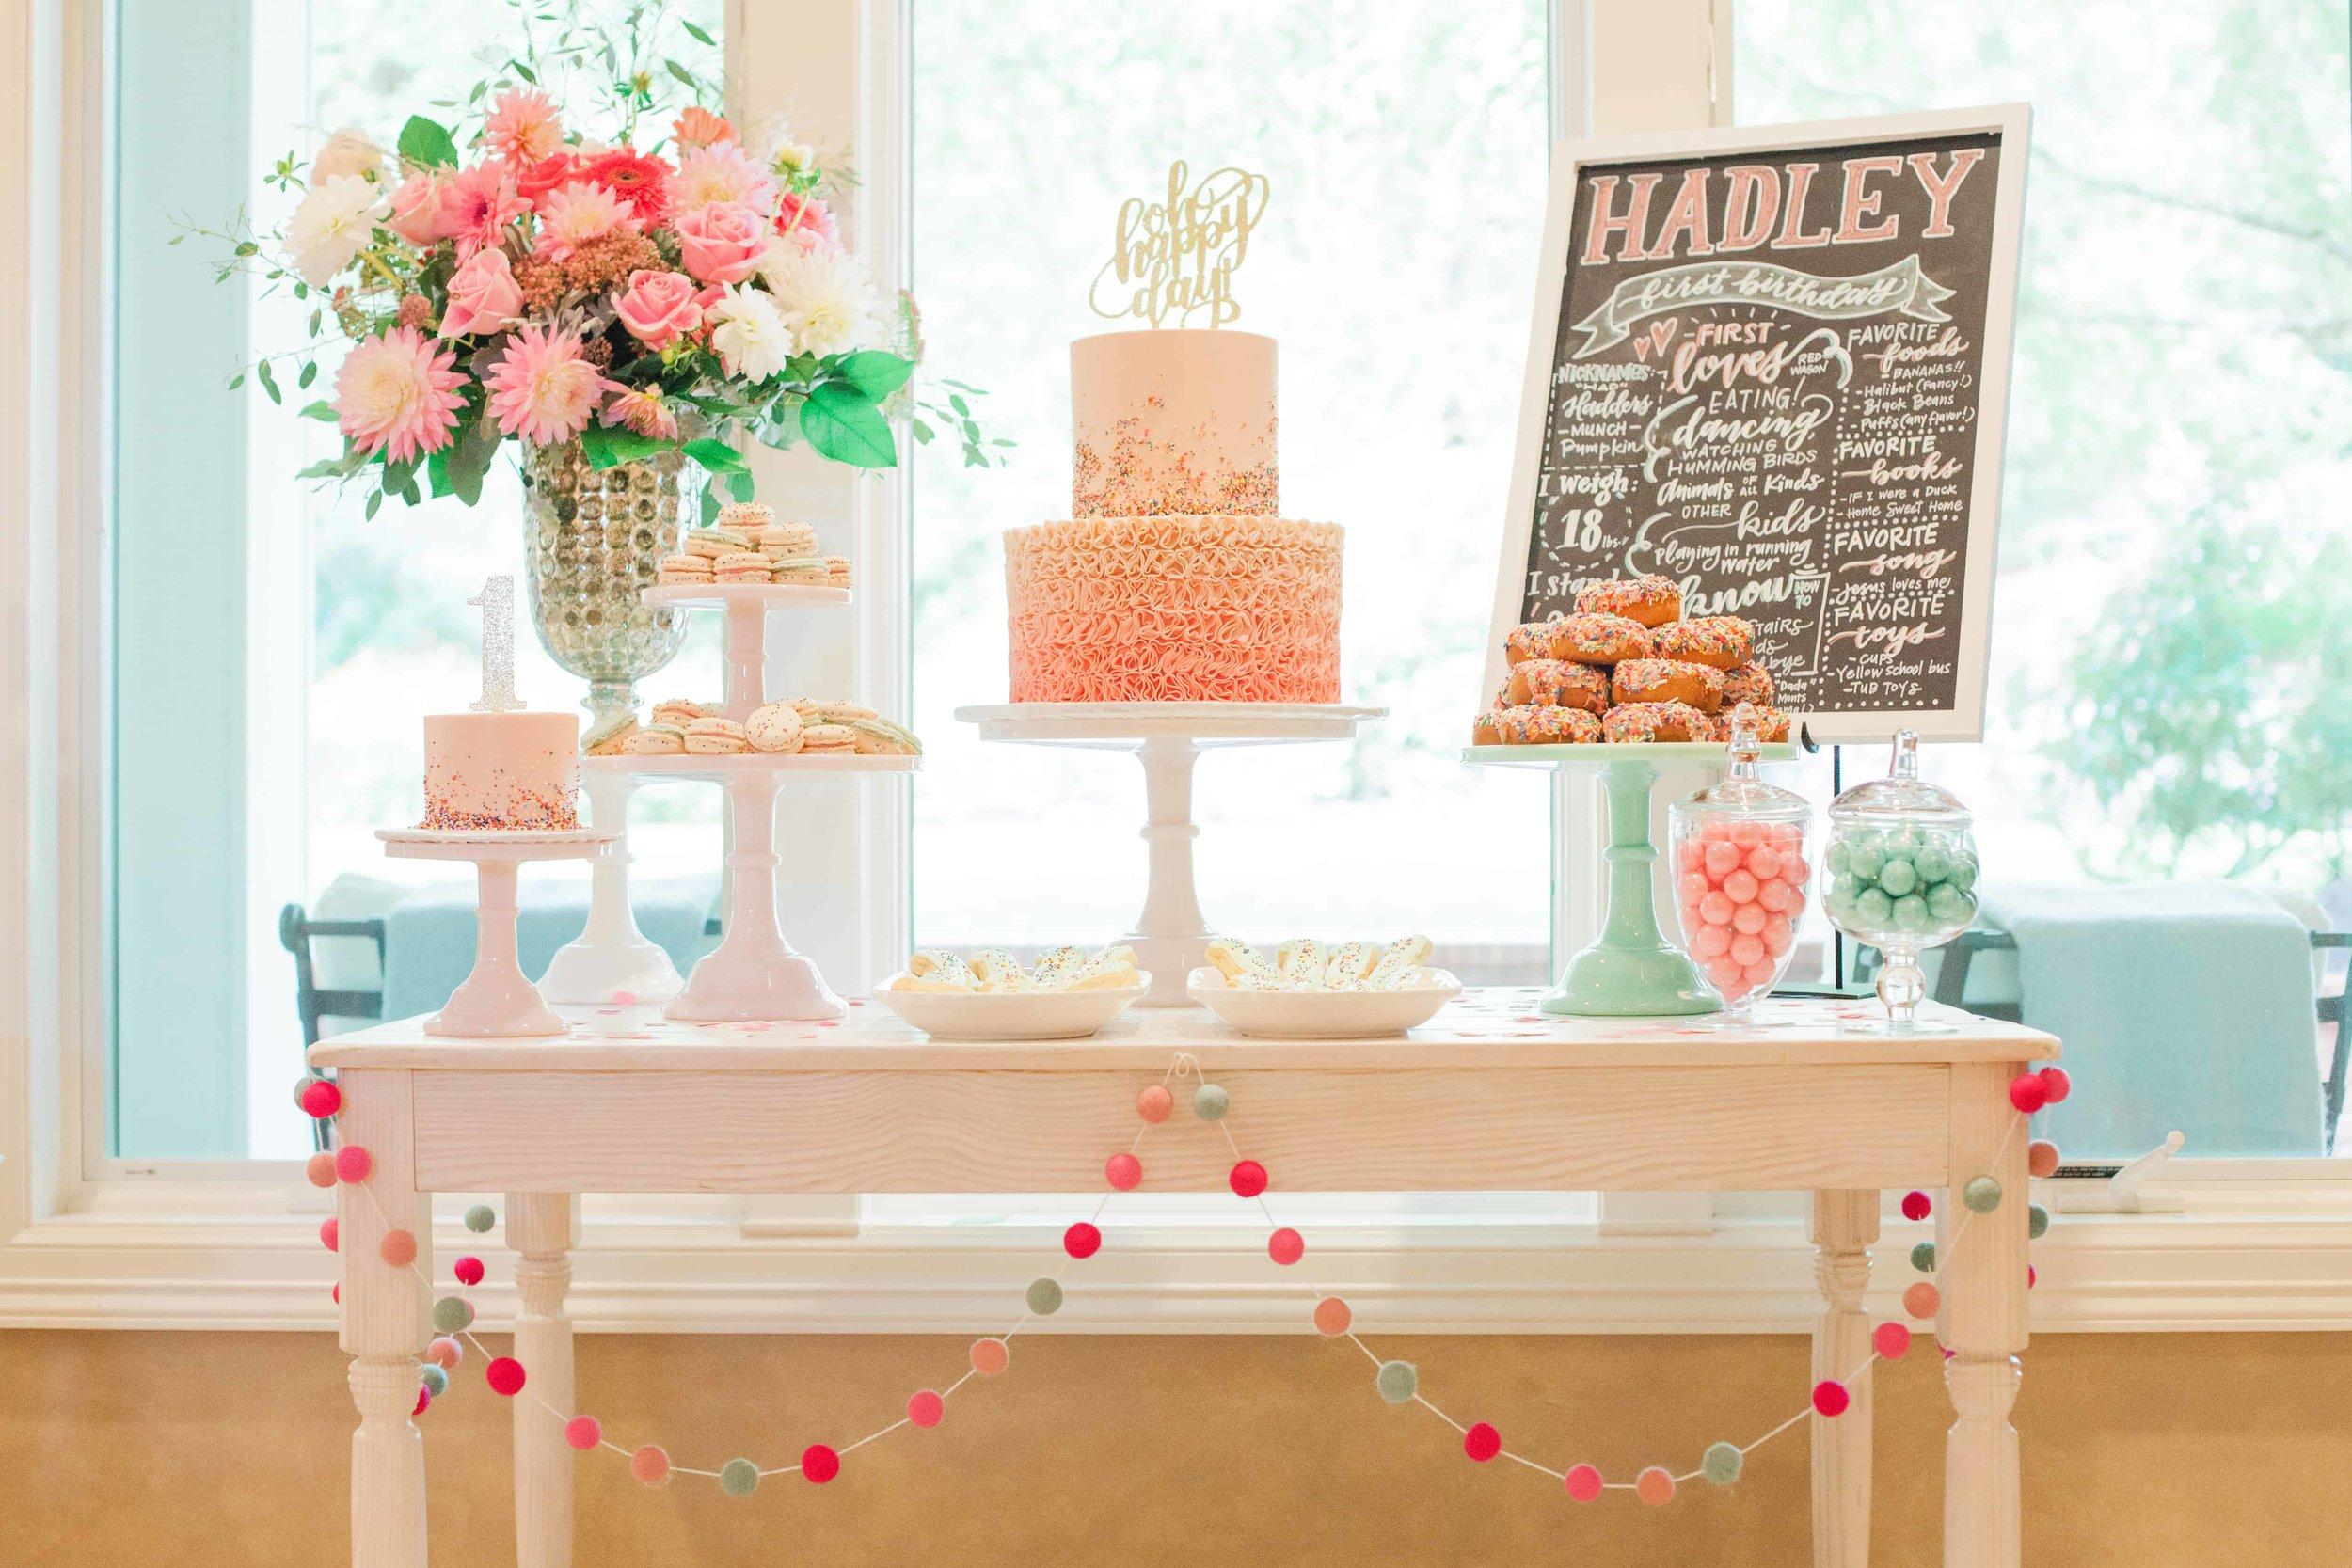 Hadley-First-Birthday-Cake-Table.jpg